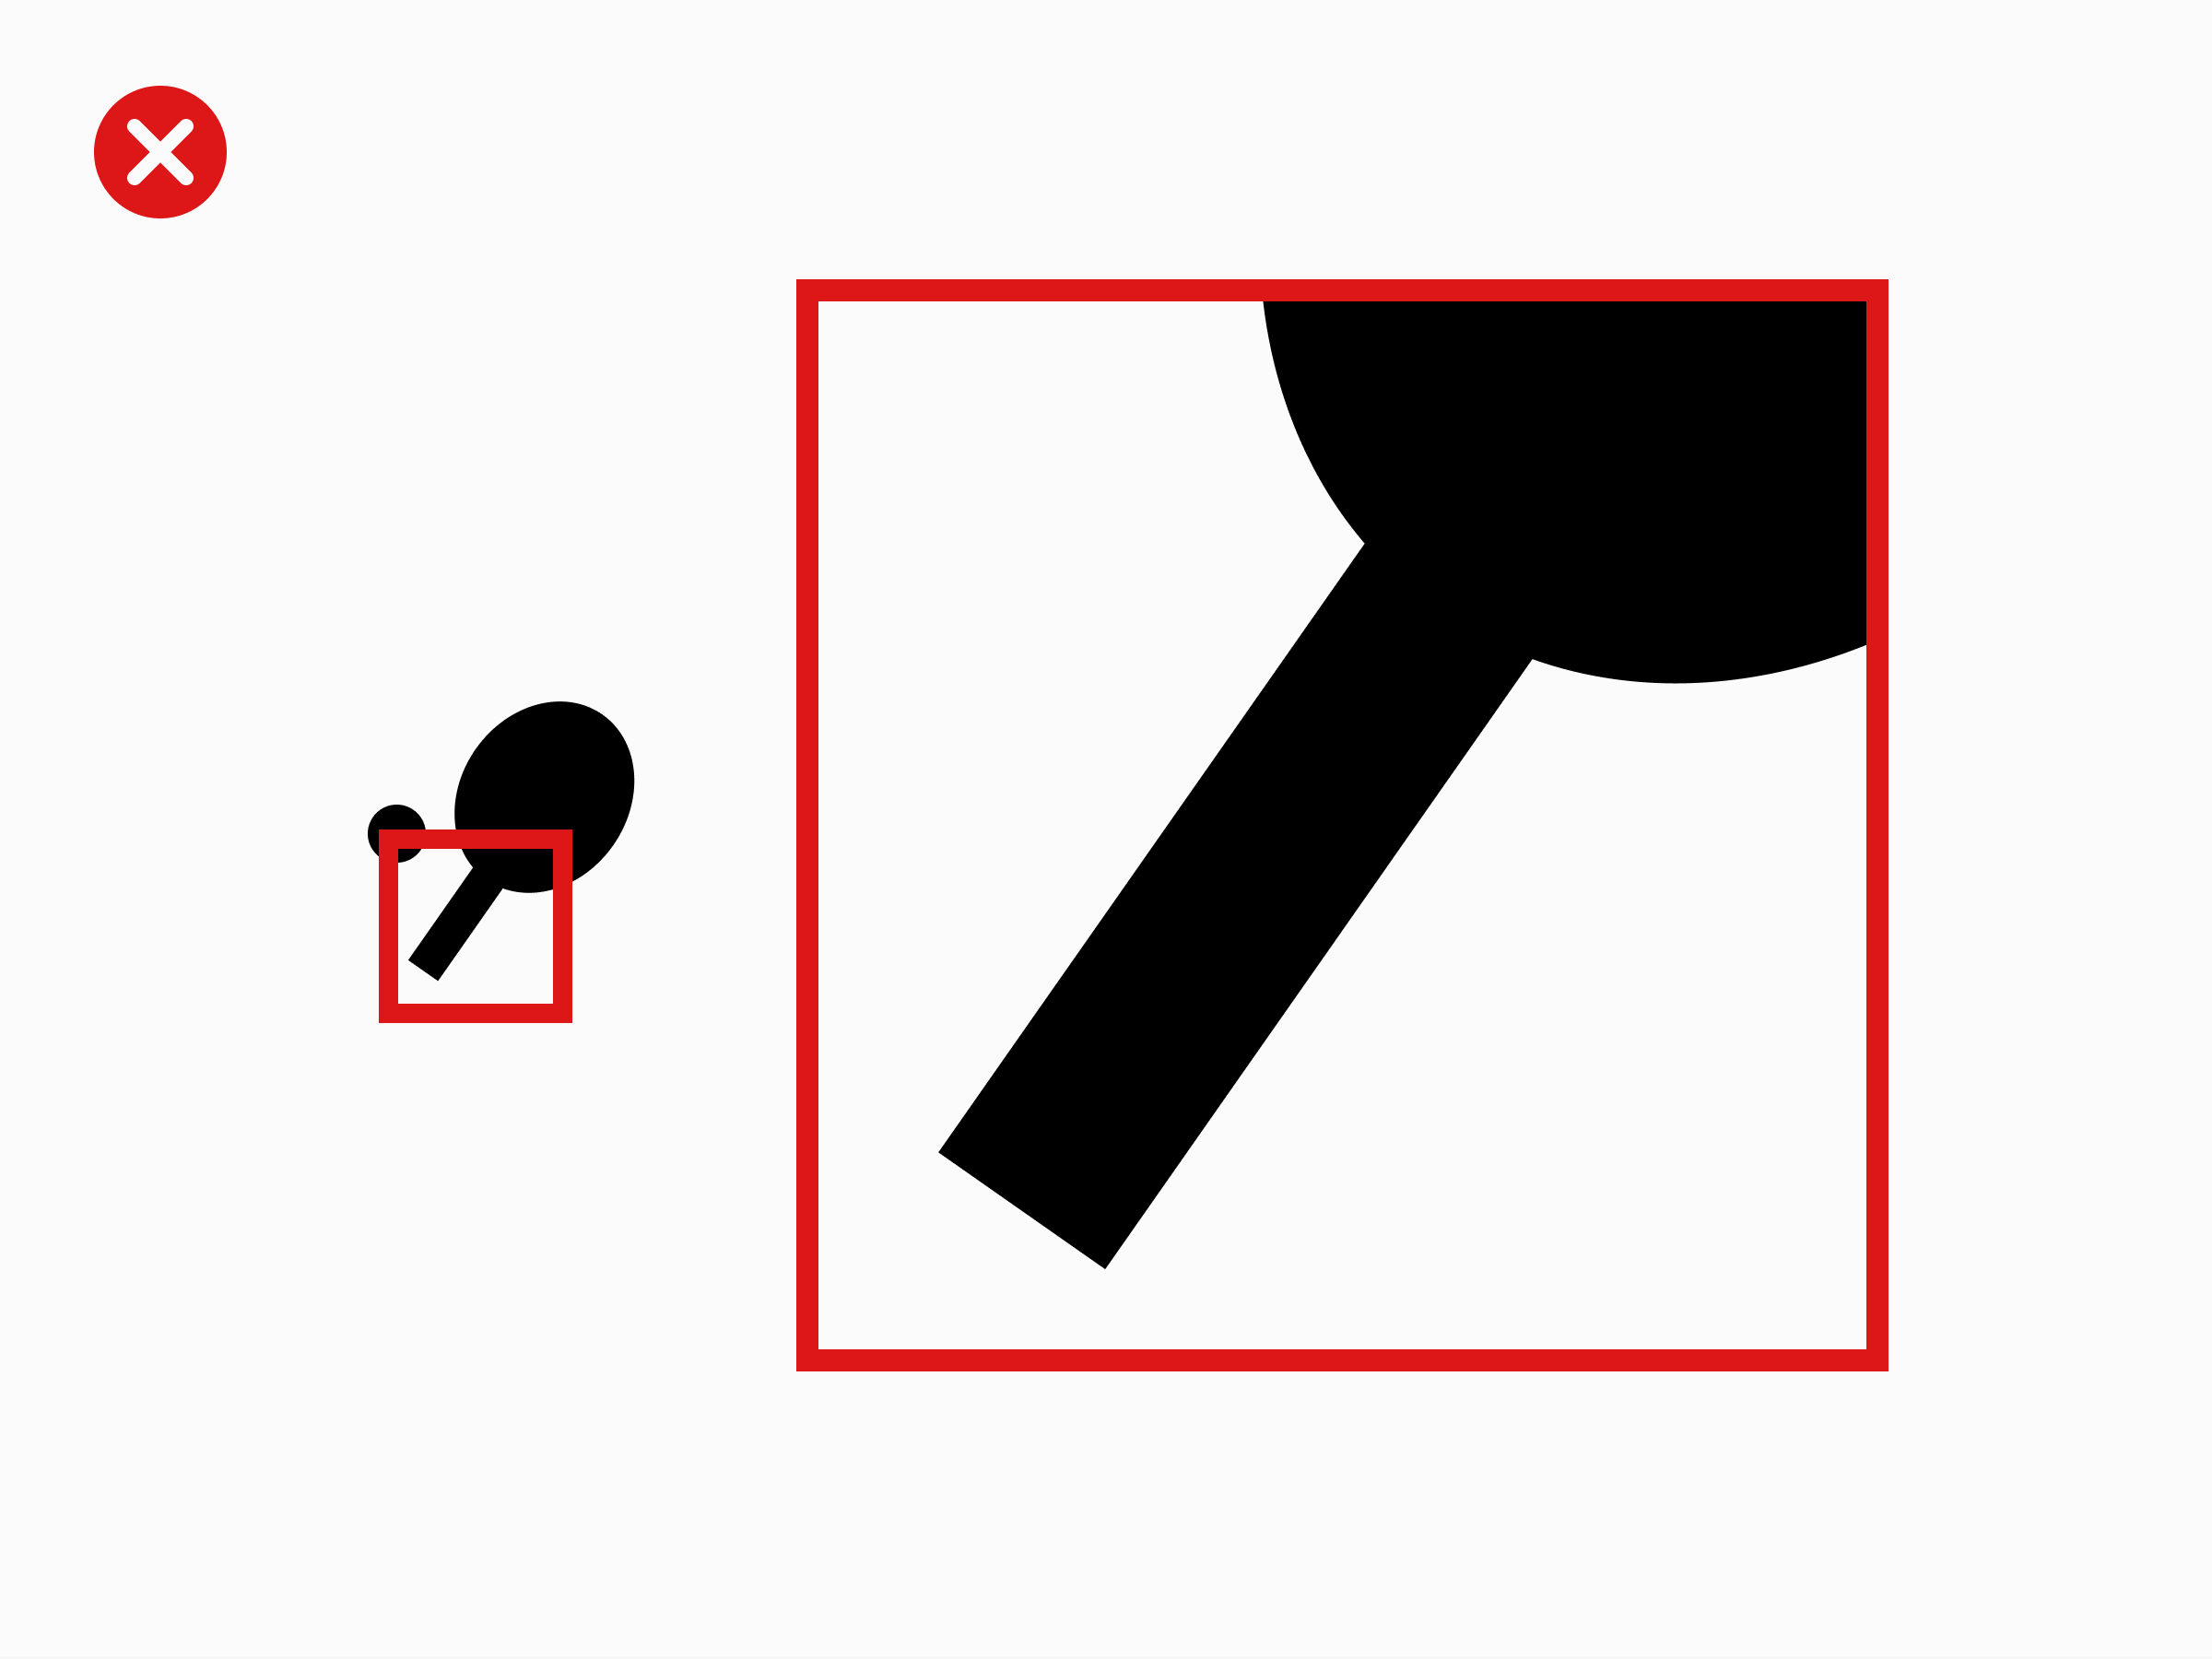 Corner radiuses are 8px X